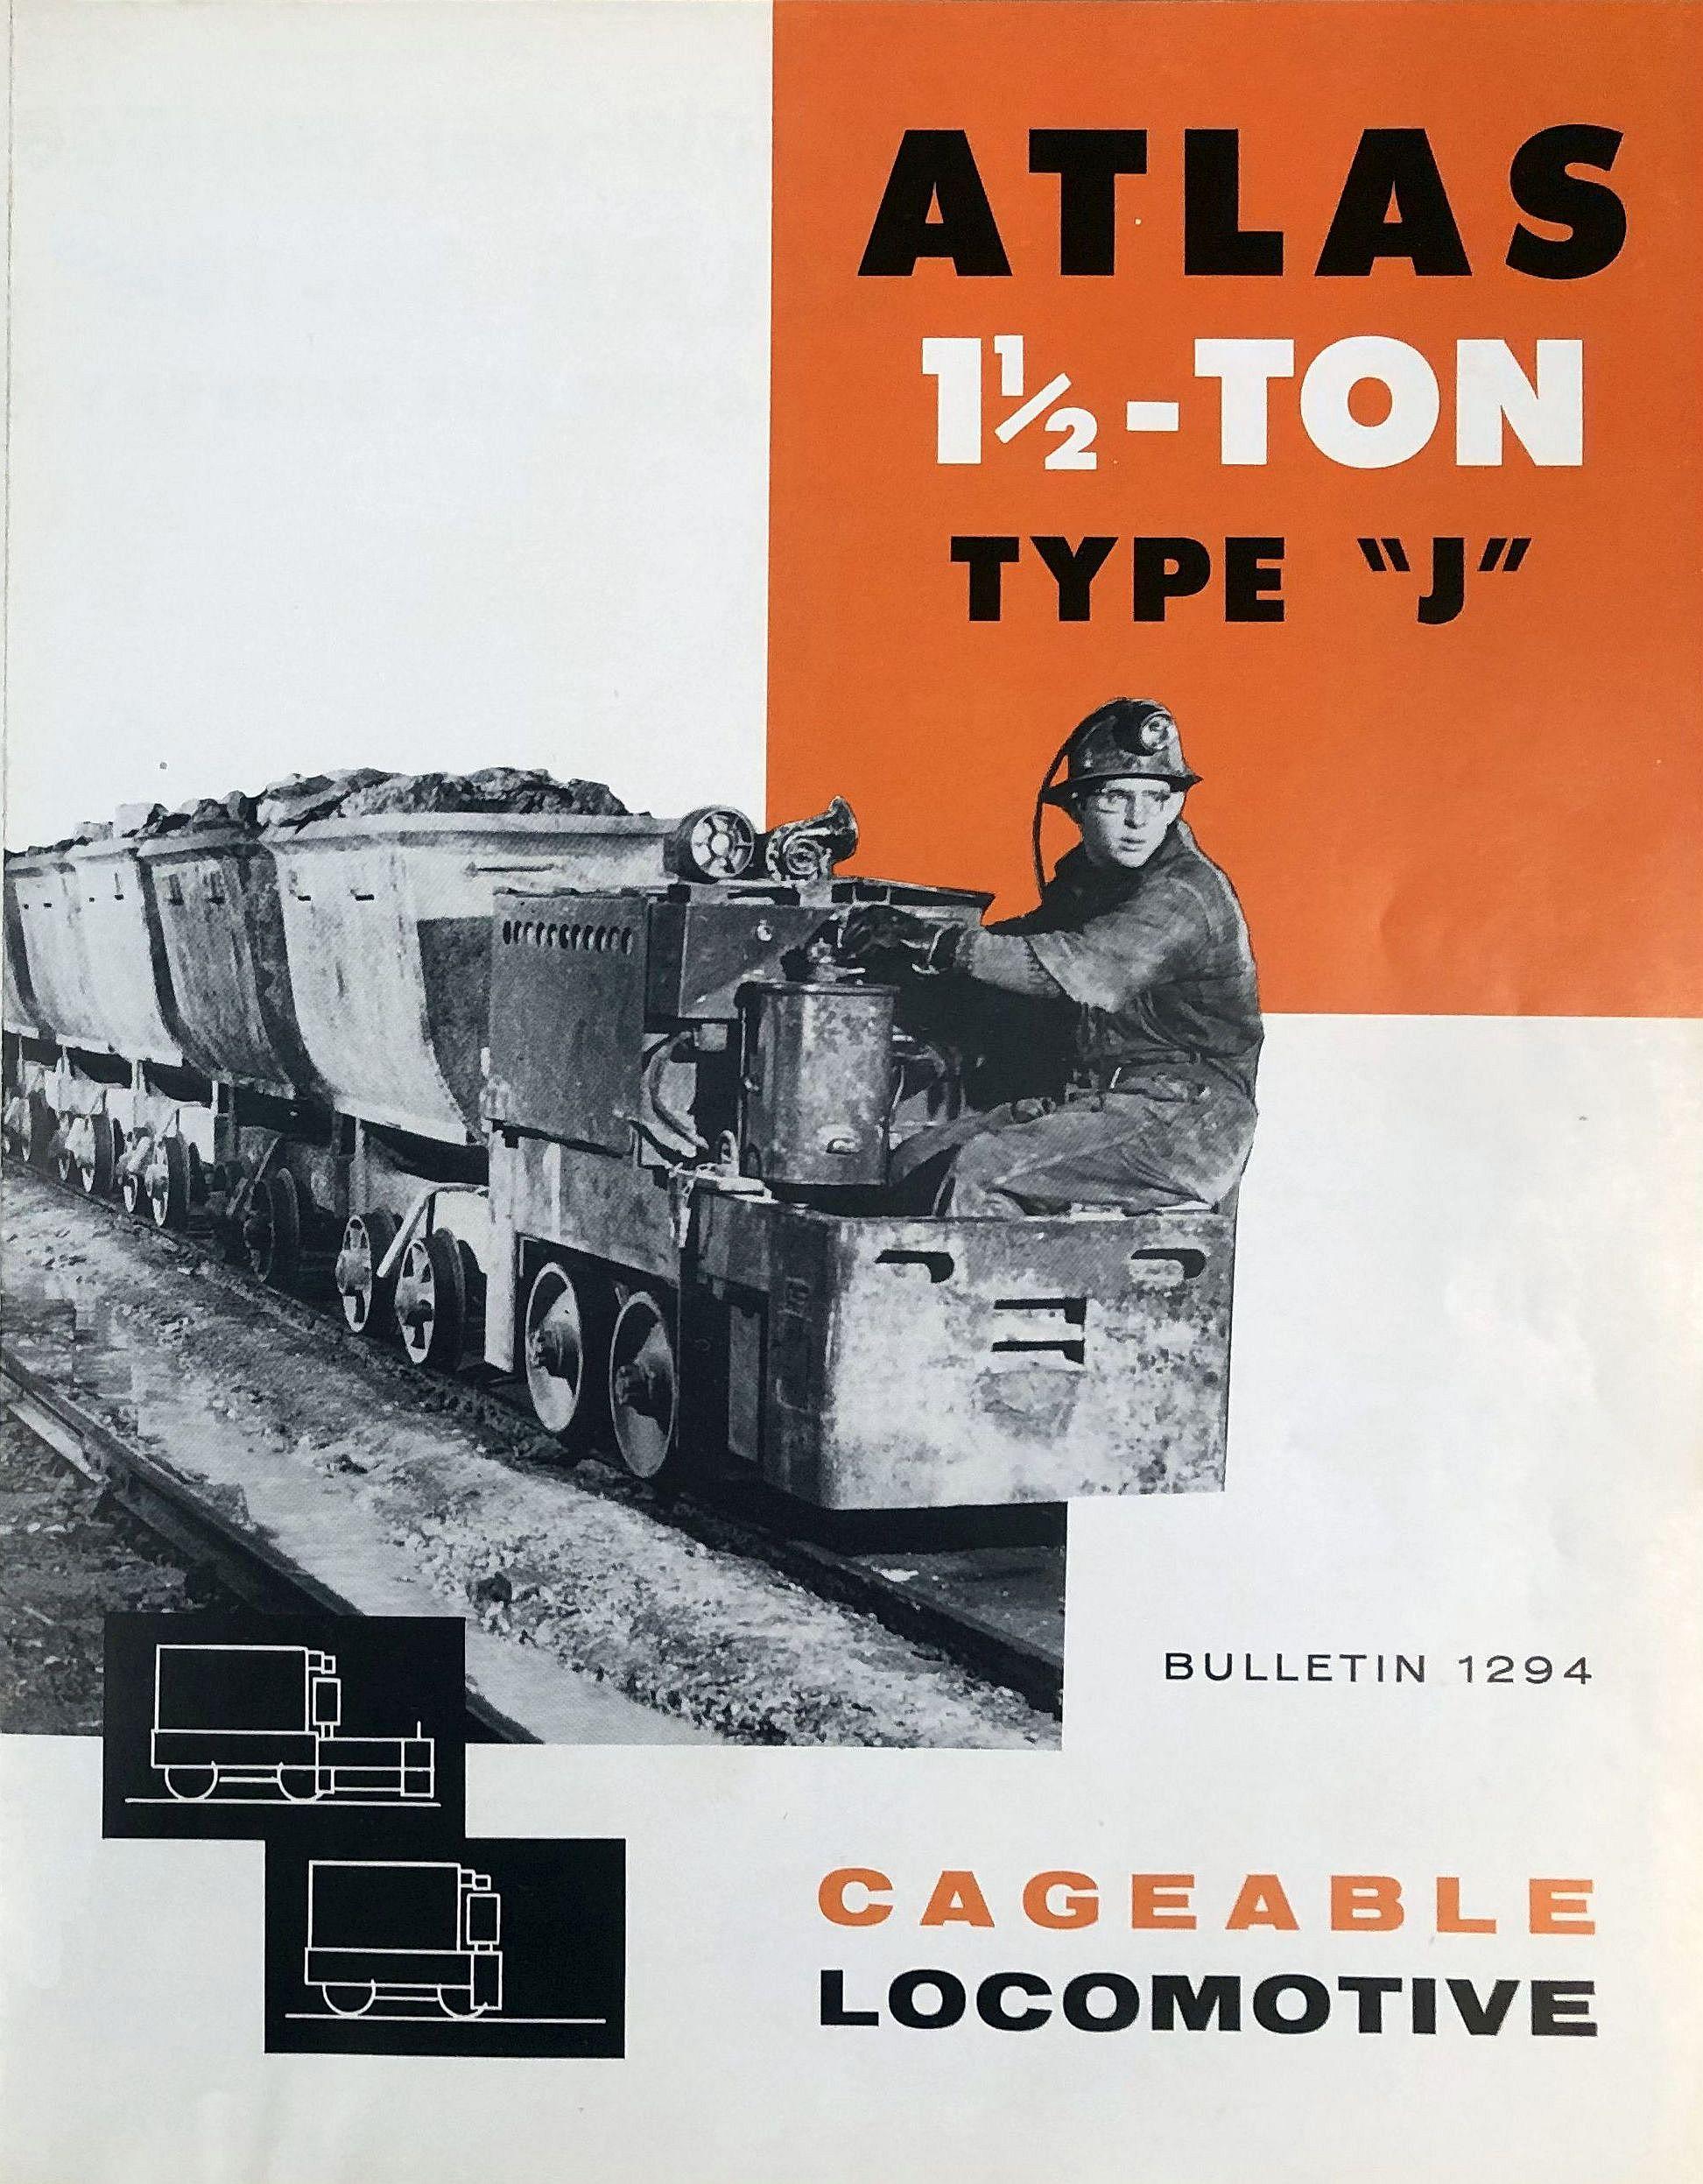 Atlas Type J Locomotive - 1